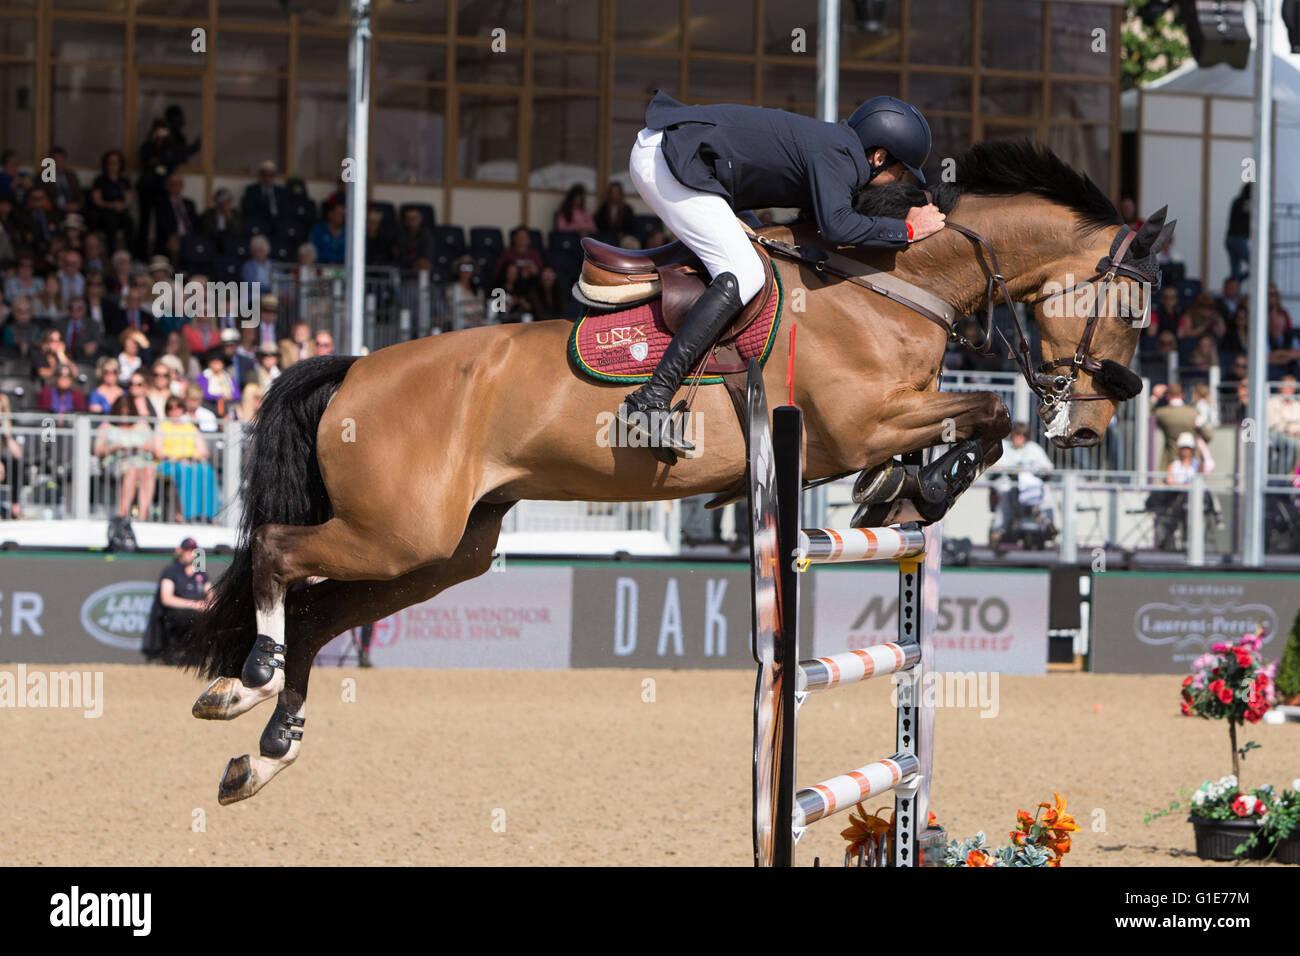 Royal Windsor Horse Show Stock Photos Royal Windsor Horse Show